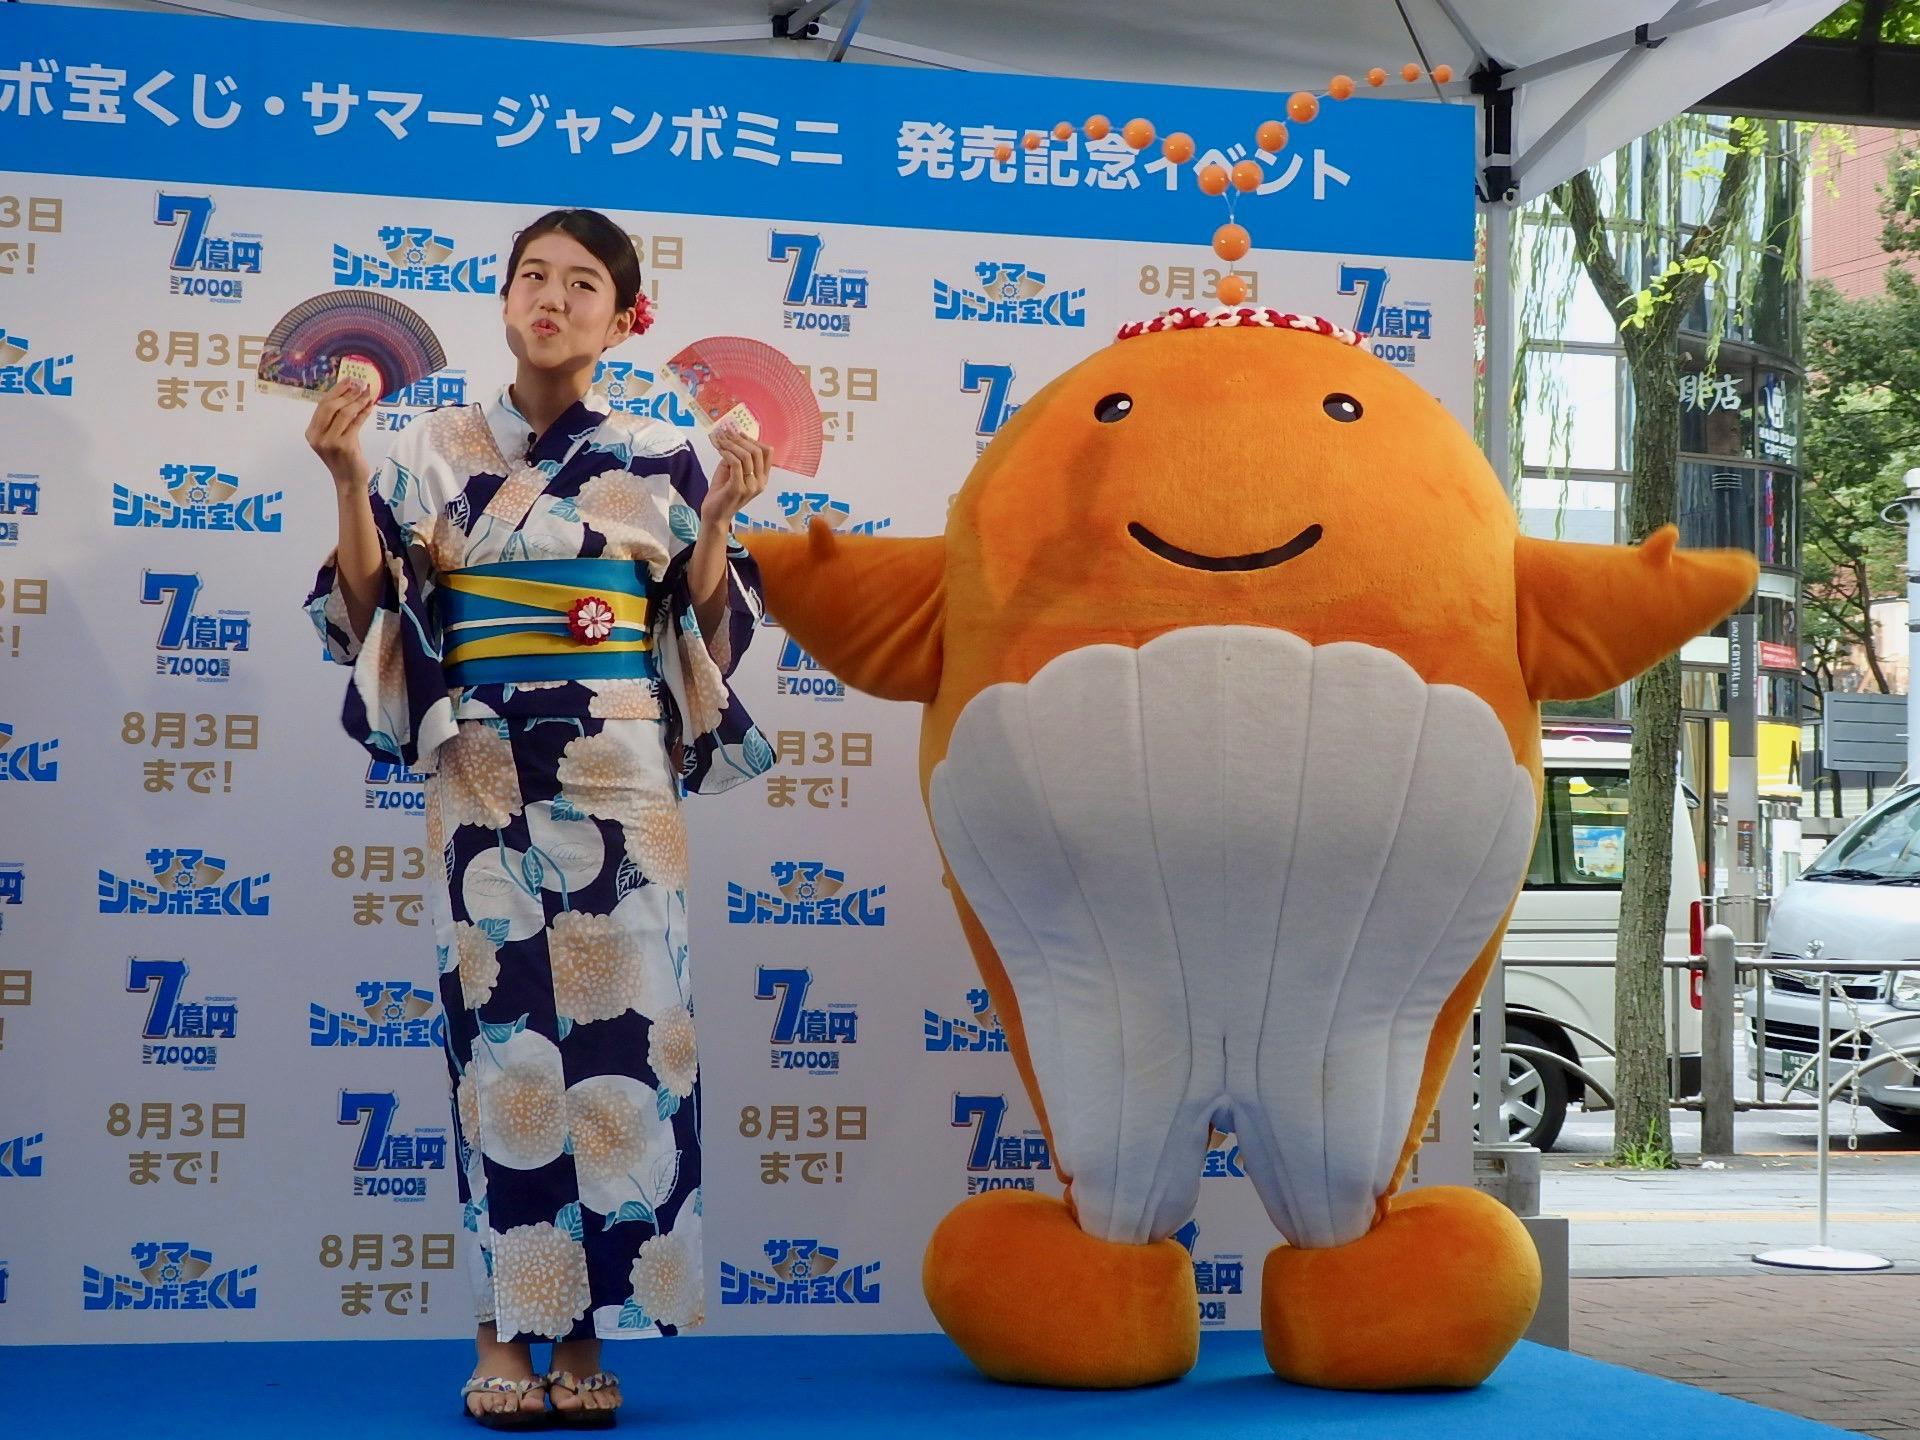 http://news.yoshimoto.co.jp/20180709203056-fc3aaa4d6f1c3e1e7ea1e839ca478c7adbbe90bc.jpg